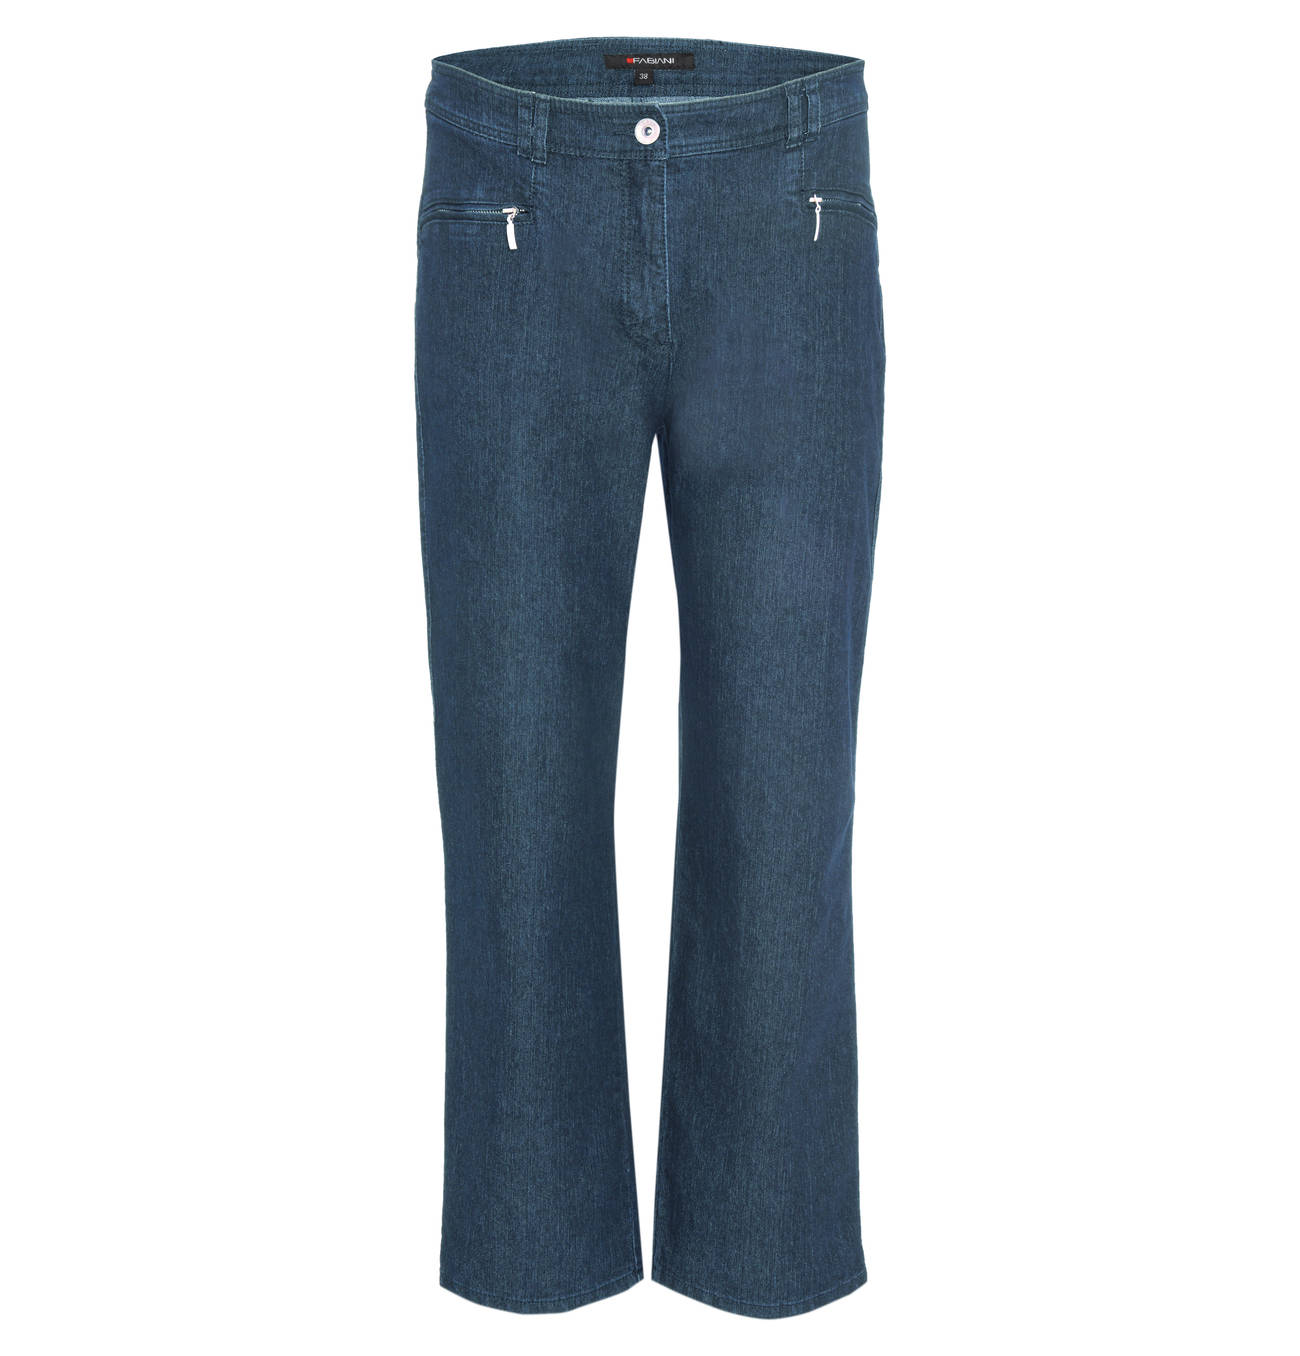 damen jeans straight schwarz high kurzgröße